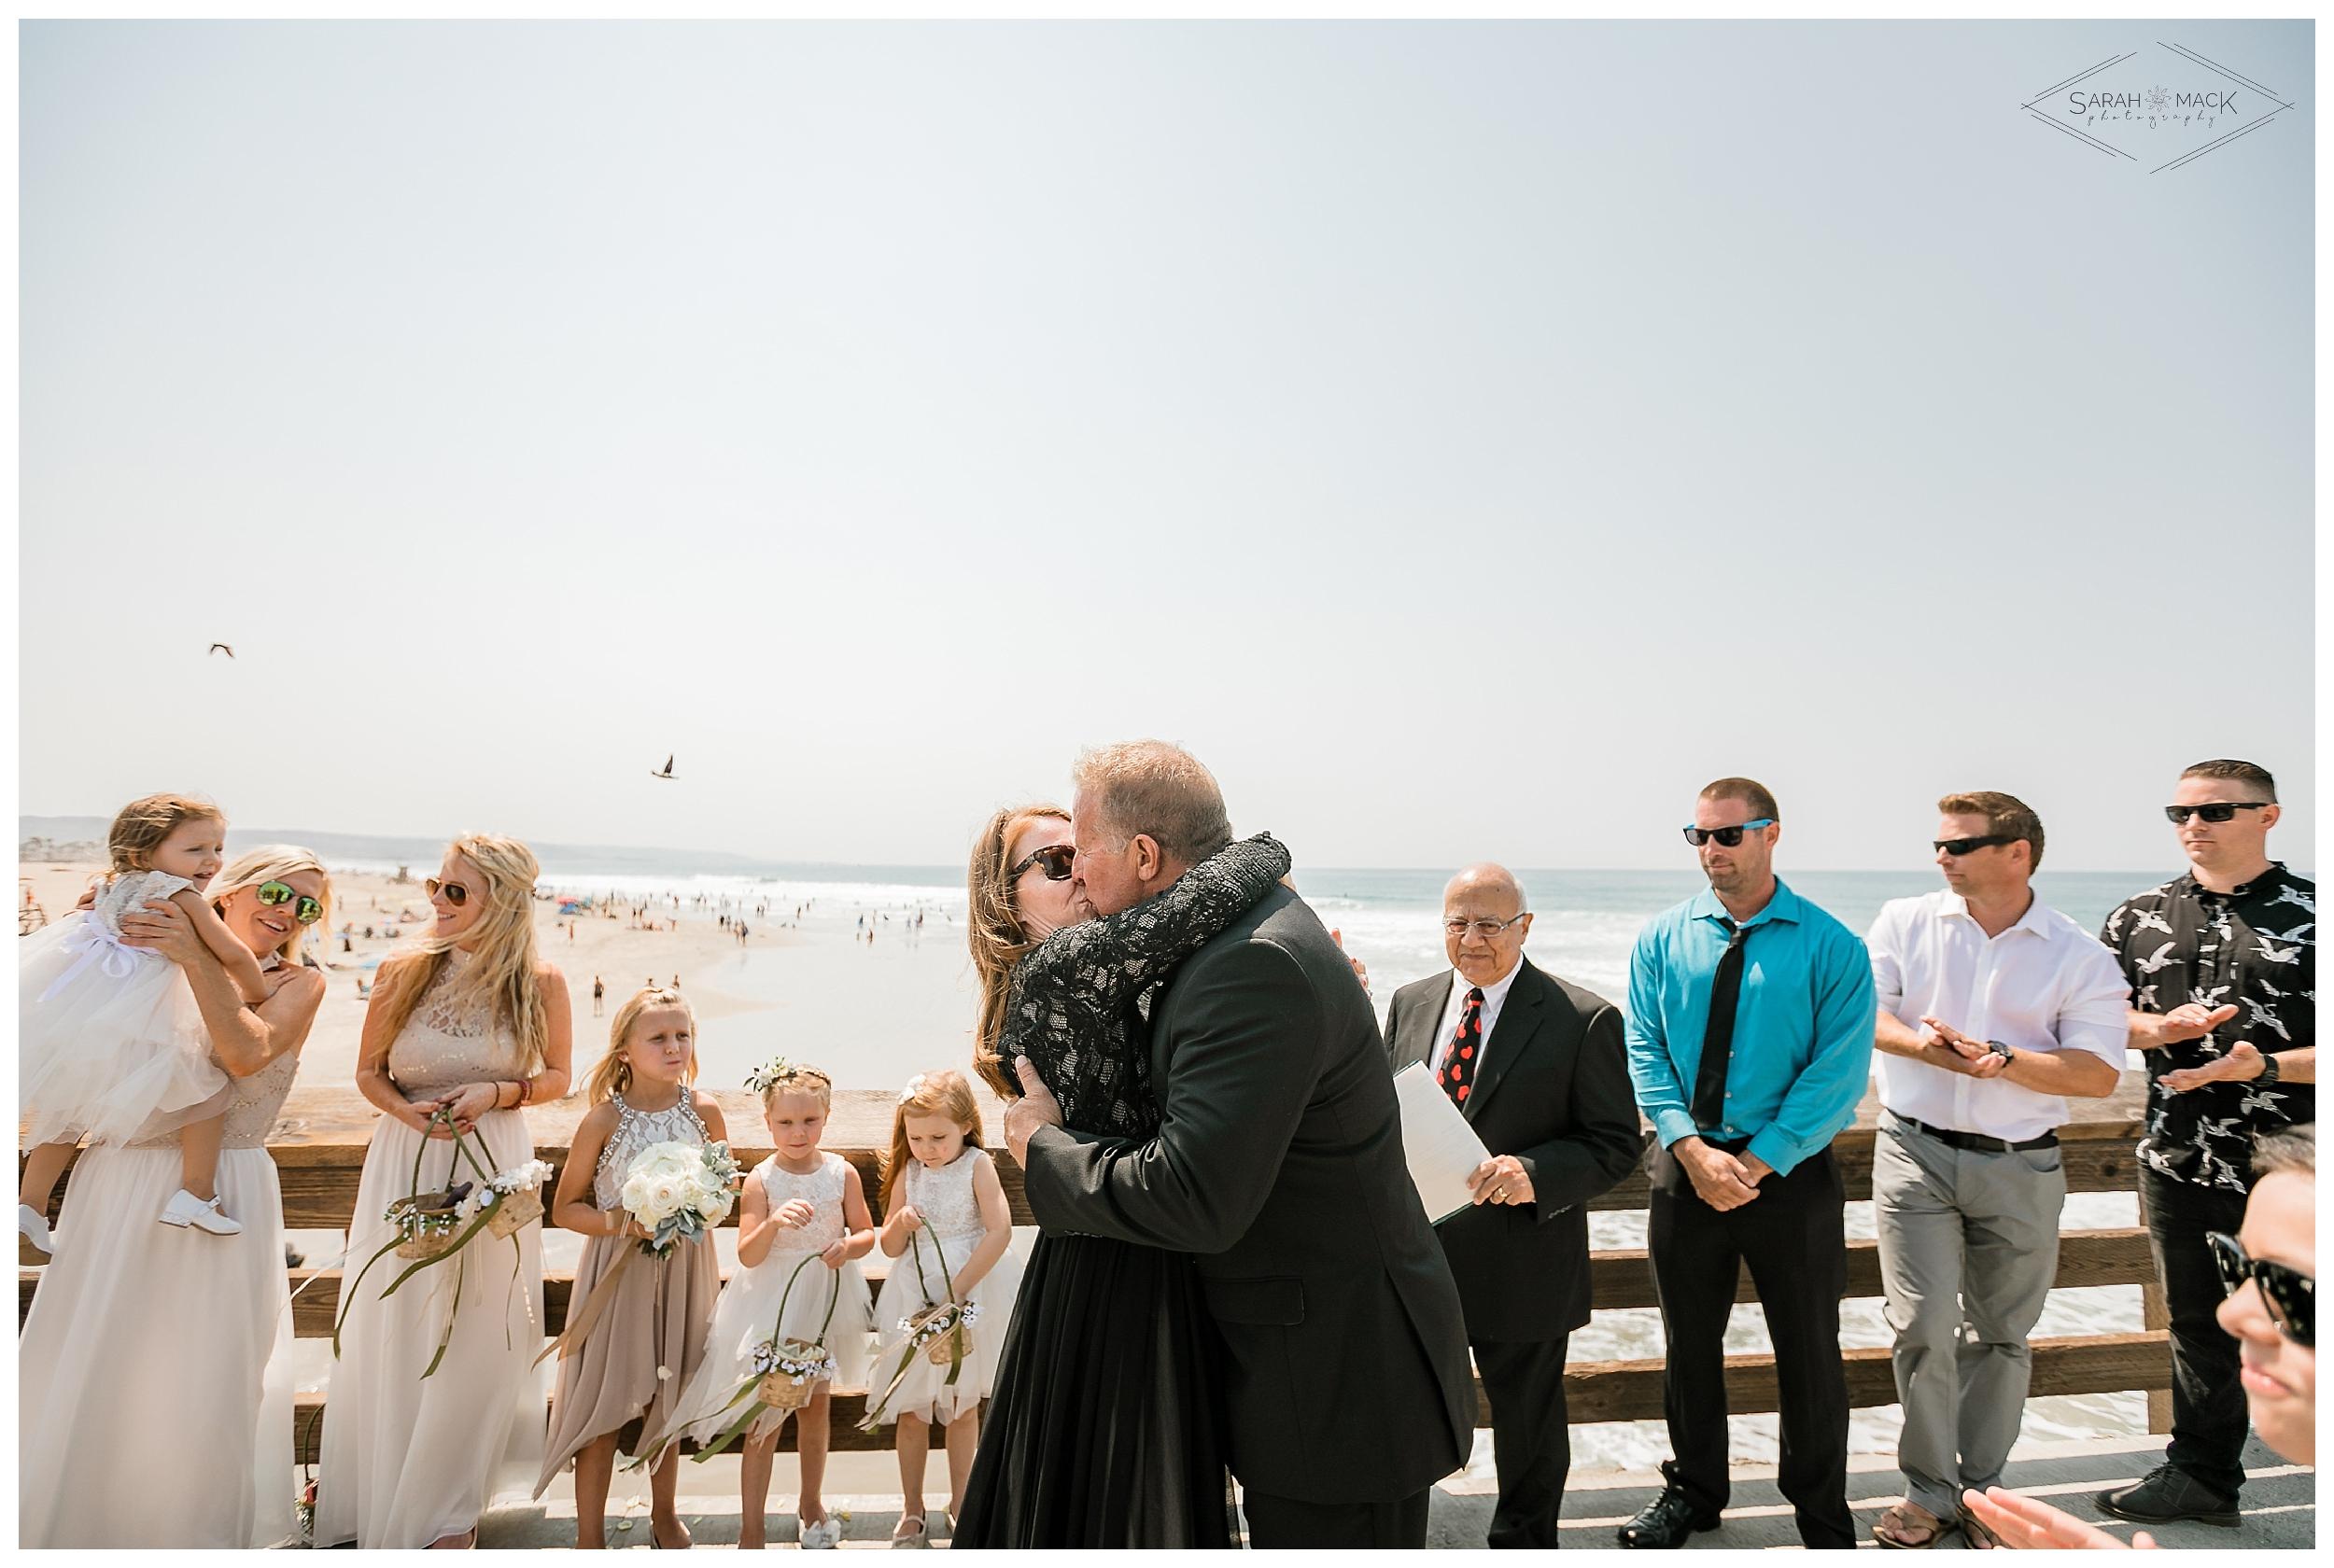 LM-Newport-Beach-Pier-Intimate-Wedding-Photography 105.jpg